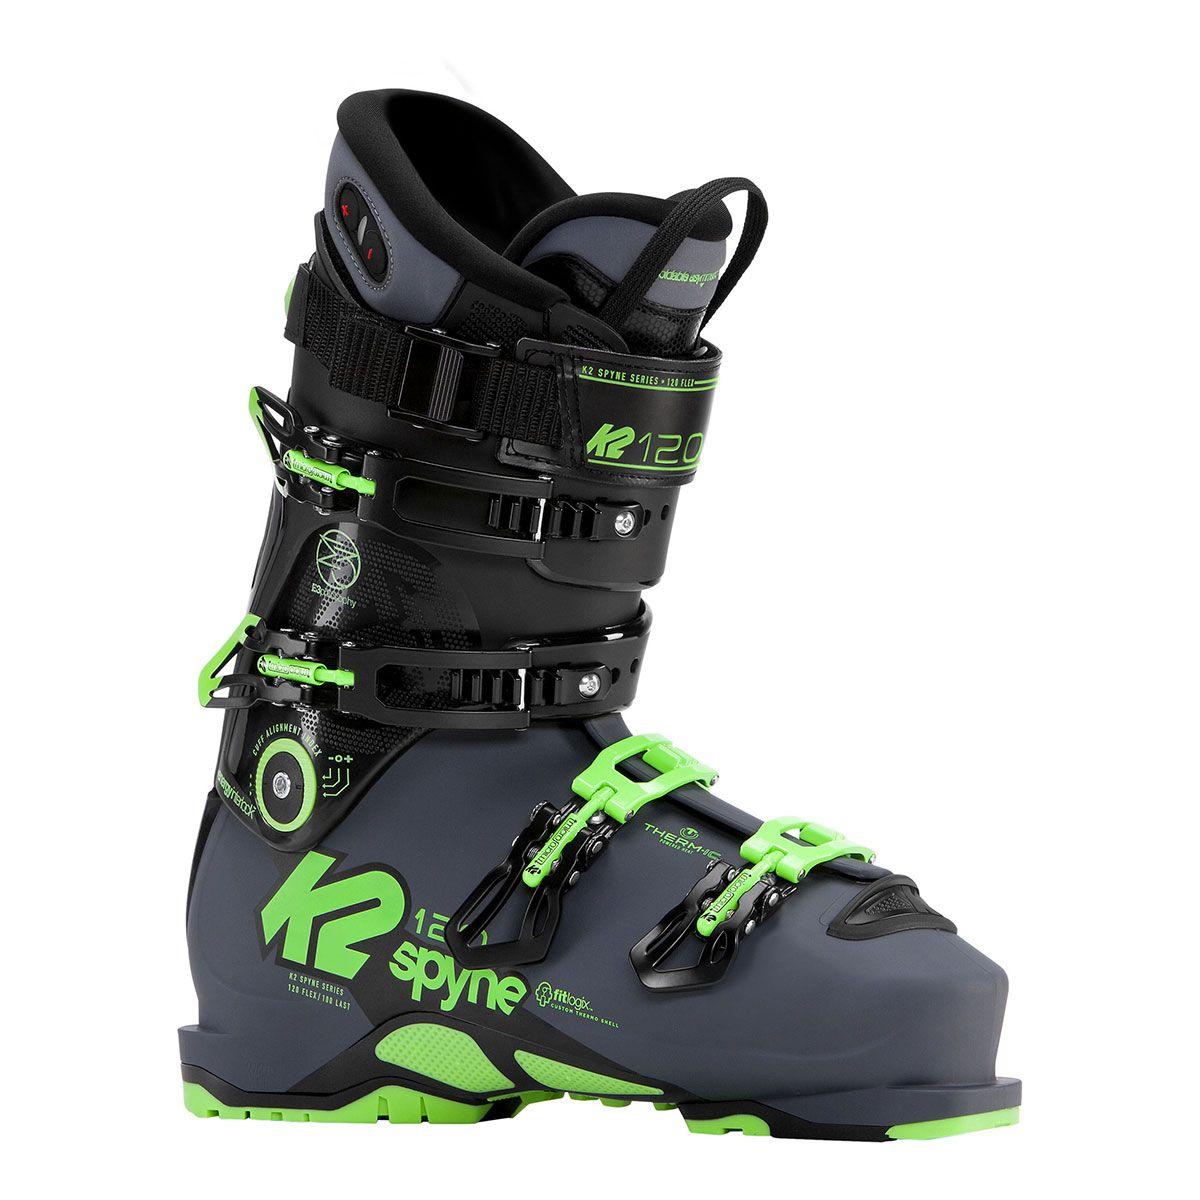 K2 spyne 120 heat ski boots ski boots boots ski boot